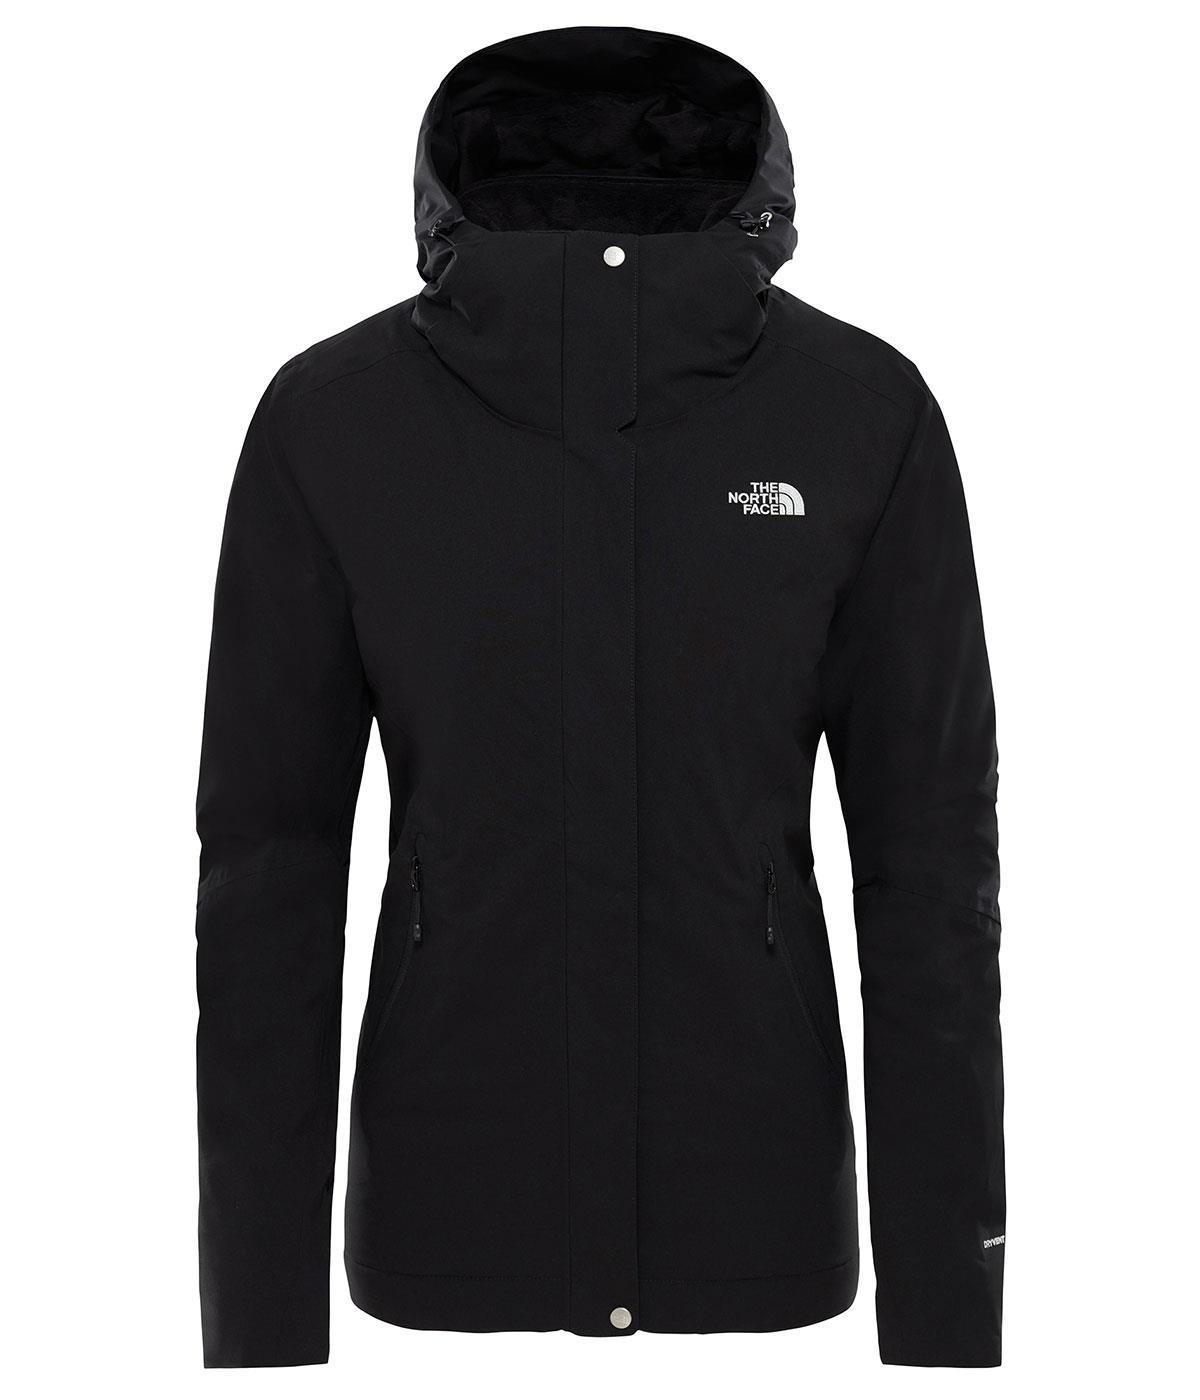 The North Face Kadın İnlux İns ceket nf0A3K2Jjk31